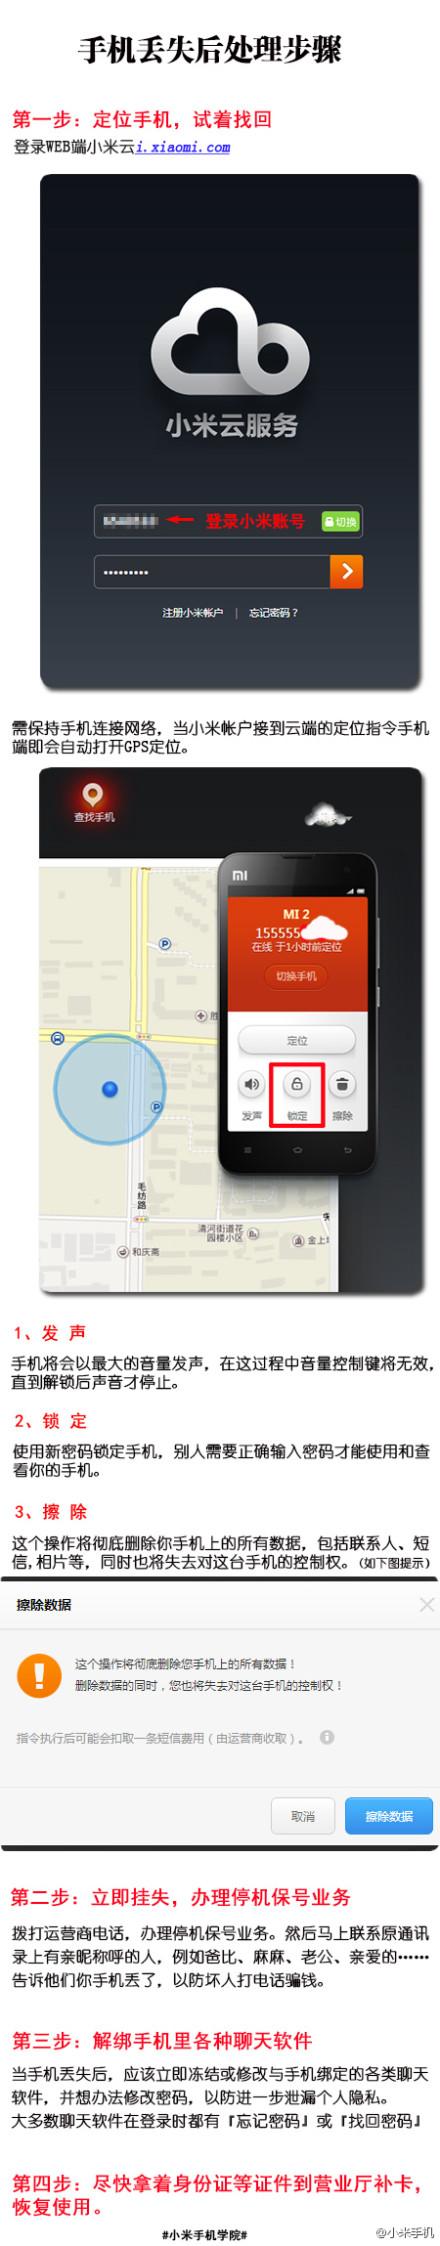 XiaomiWeiboEmergencyPhoneWipe2